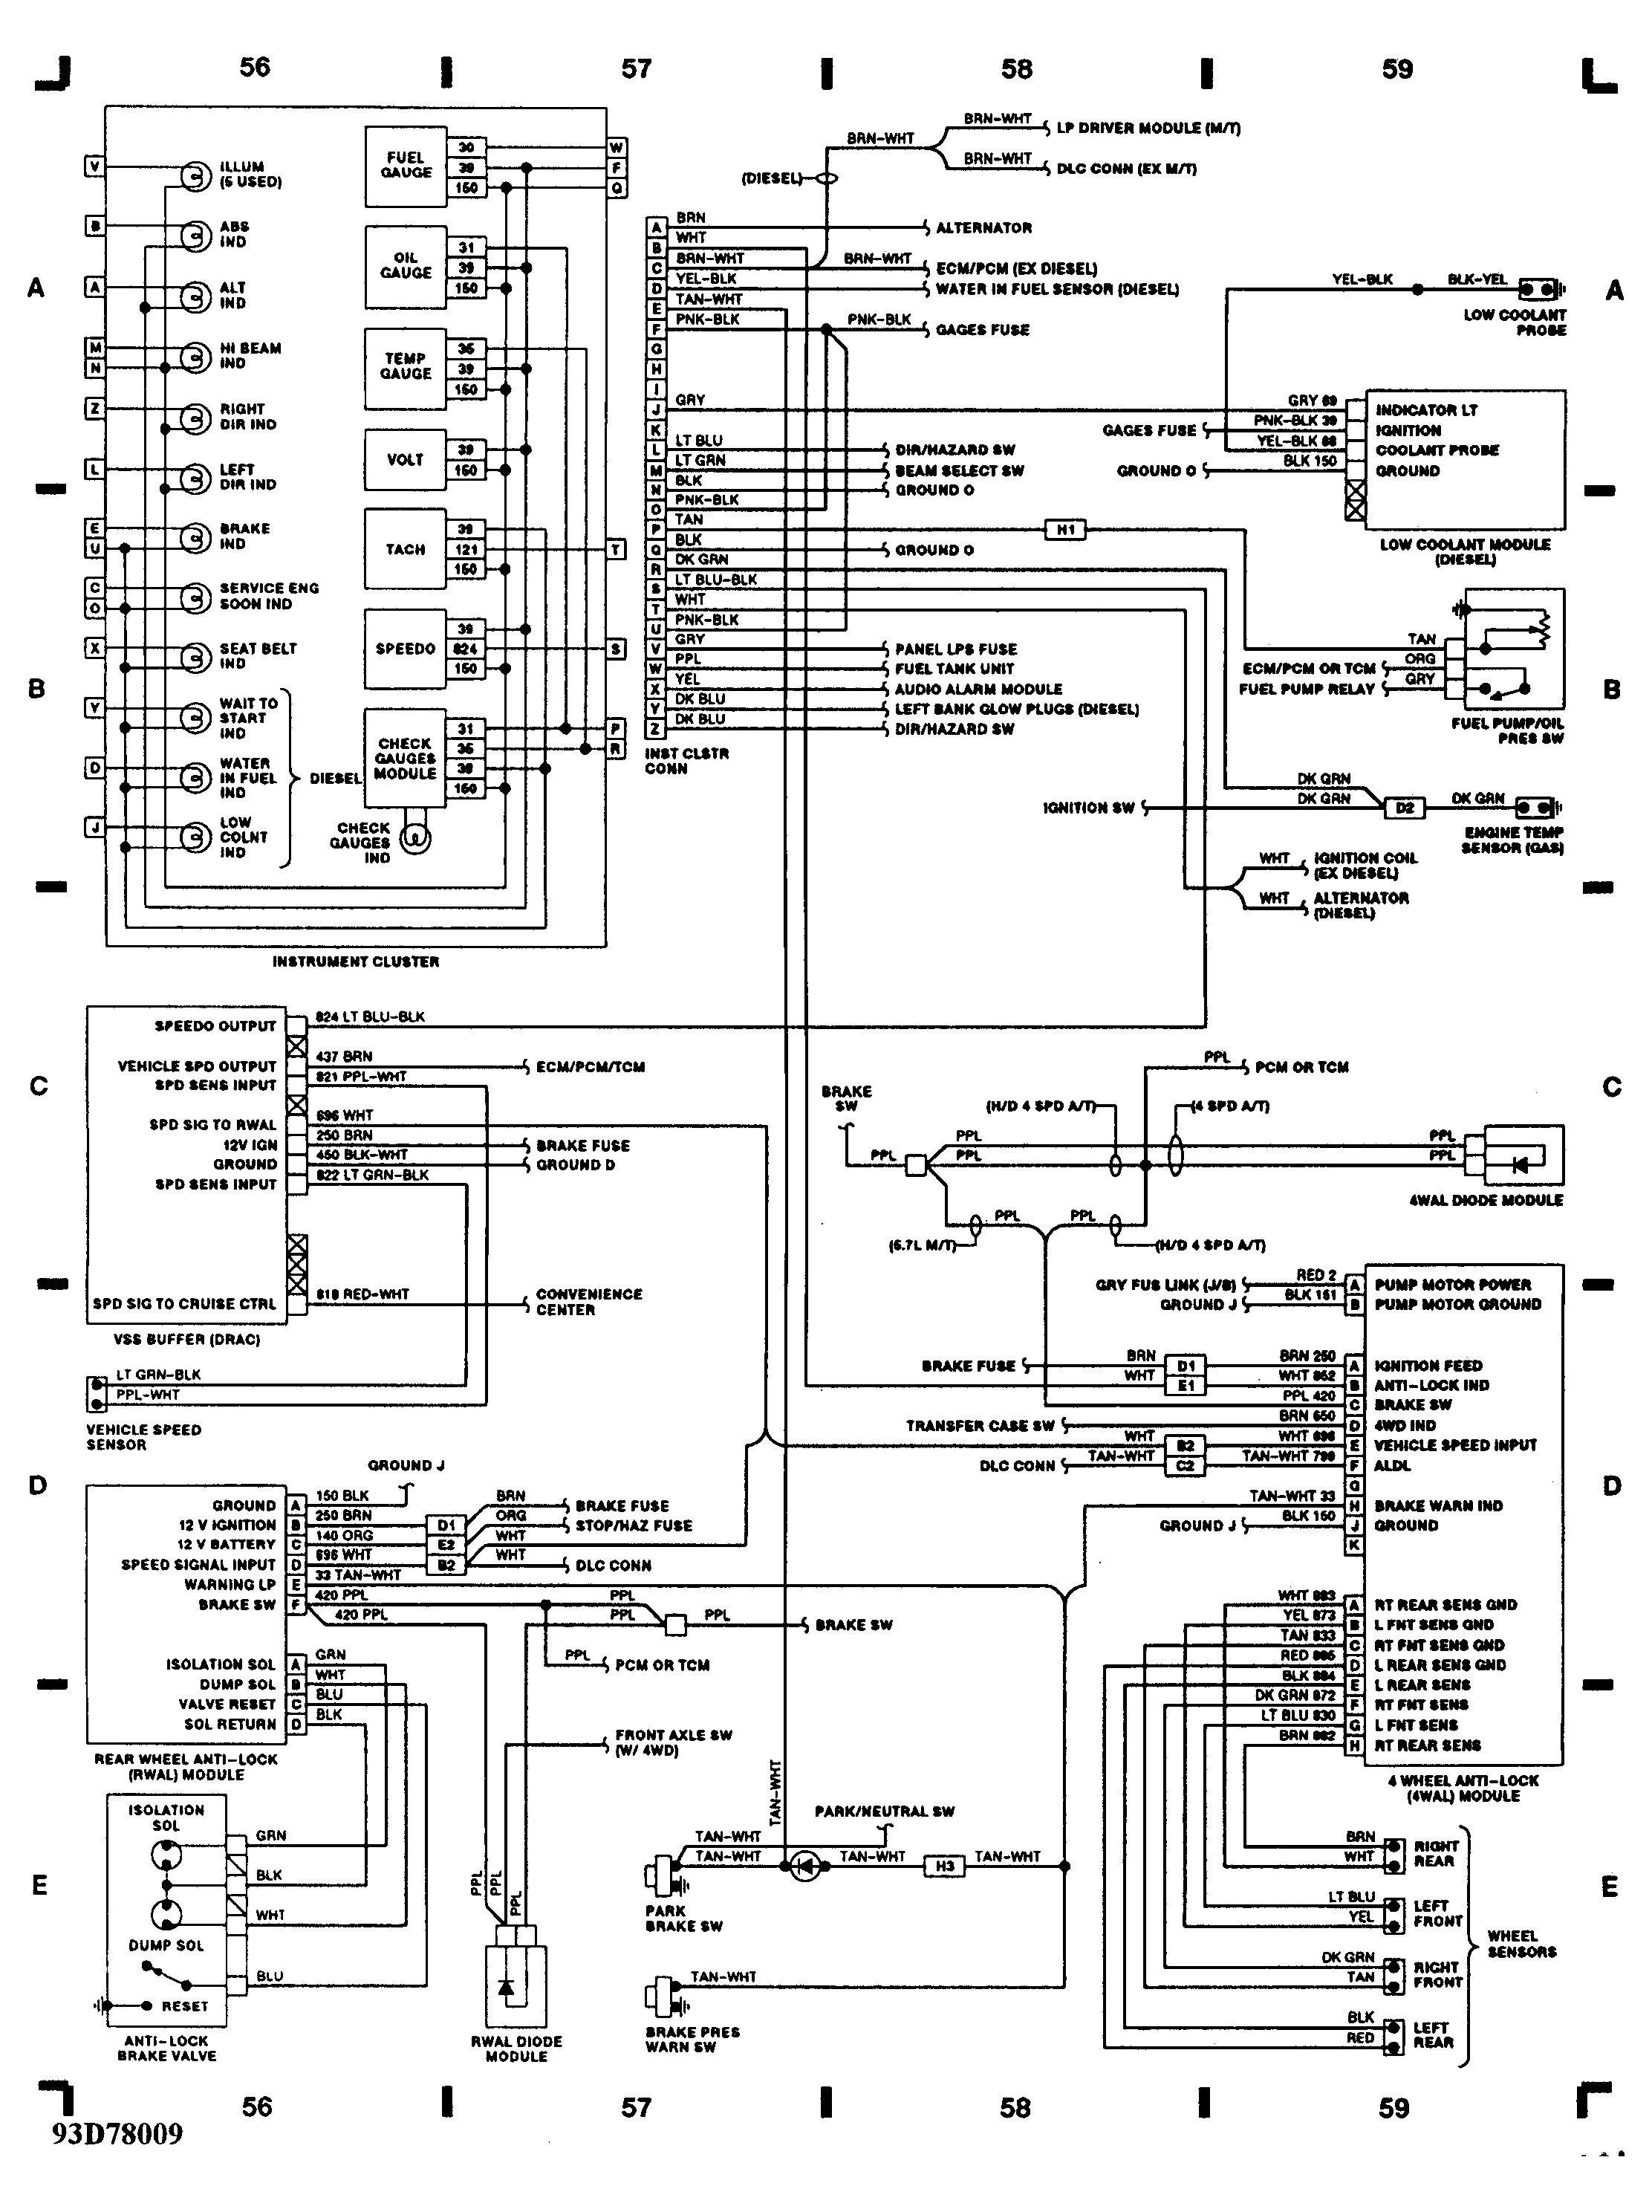 2004 Gmc Sierra Fuel Pump Fuel Pump Ground Wire Diagram] 2006 Chevy 3500 Wiring Diagram Full Version Hd Of 2004 Gmc Sierra Fuel Pump Fuel Pump Ground Wire